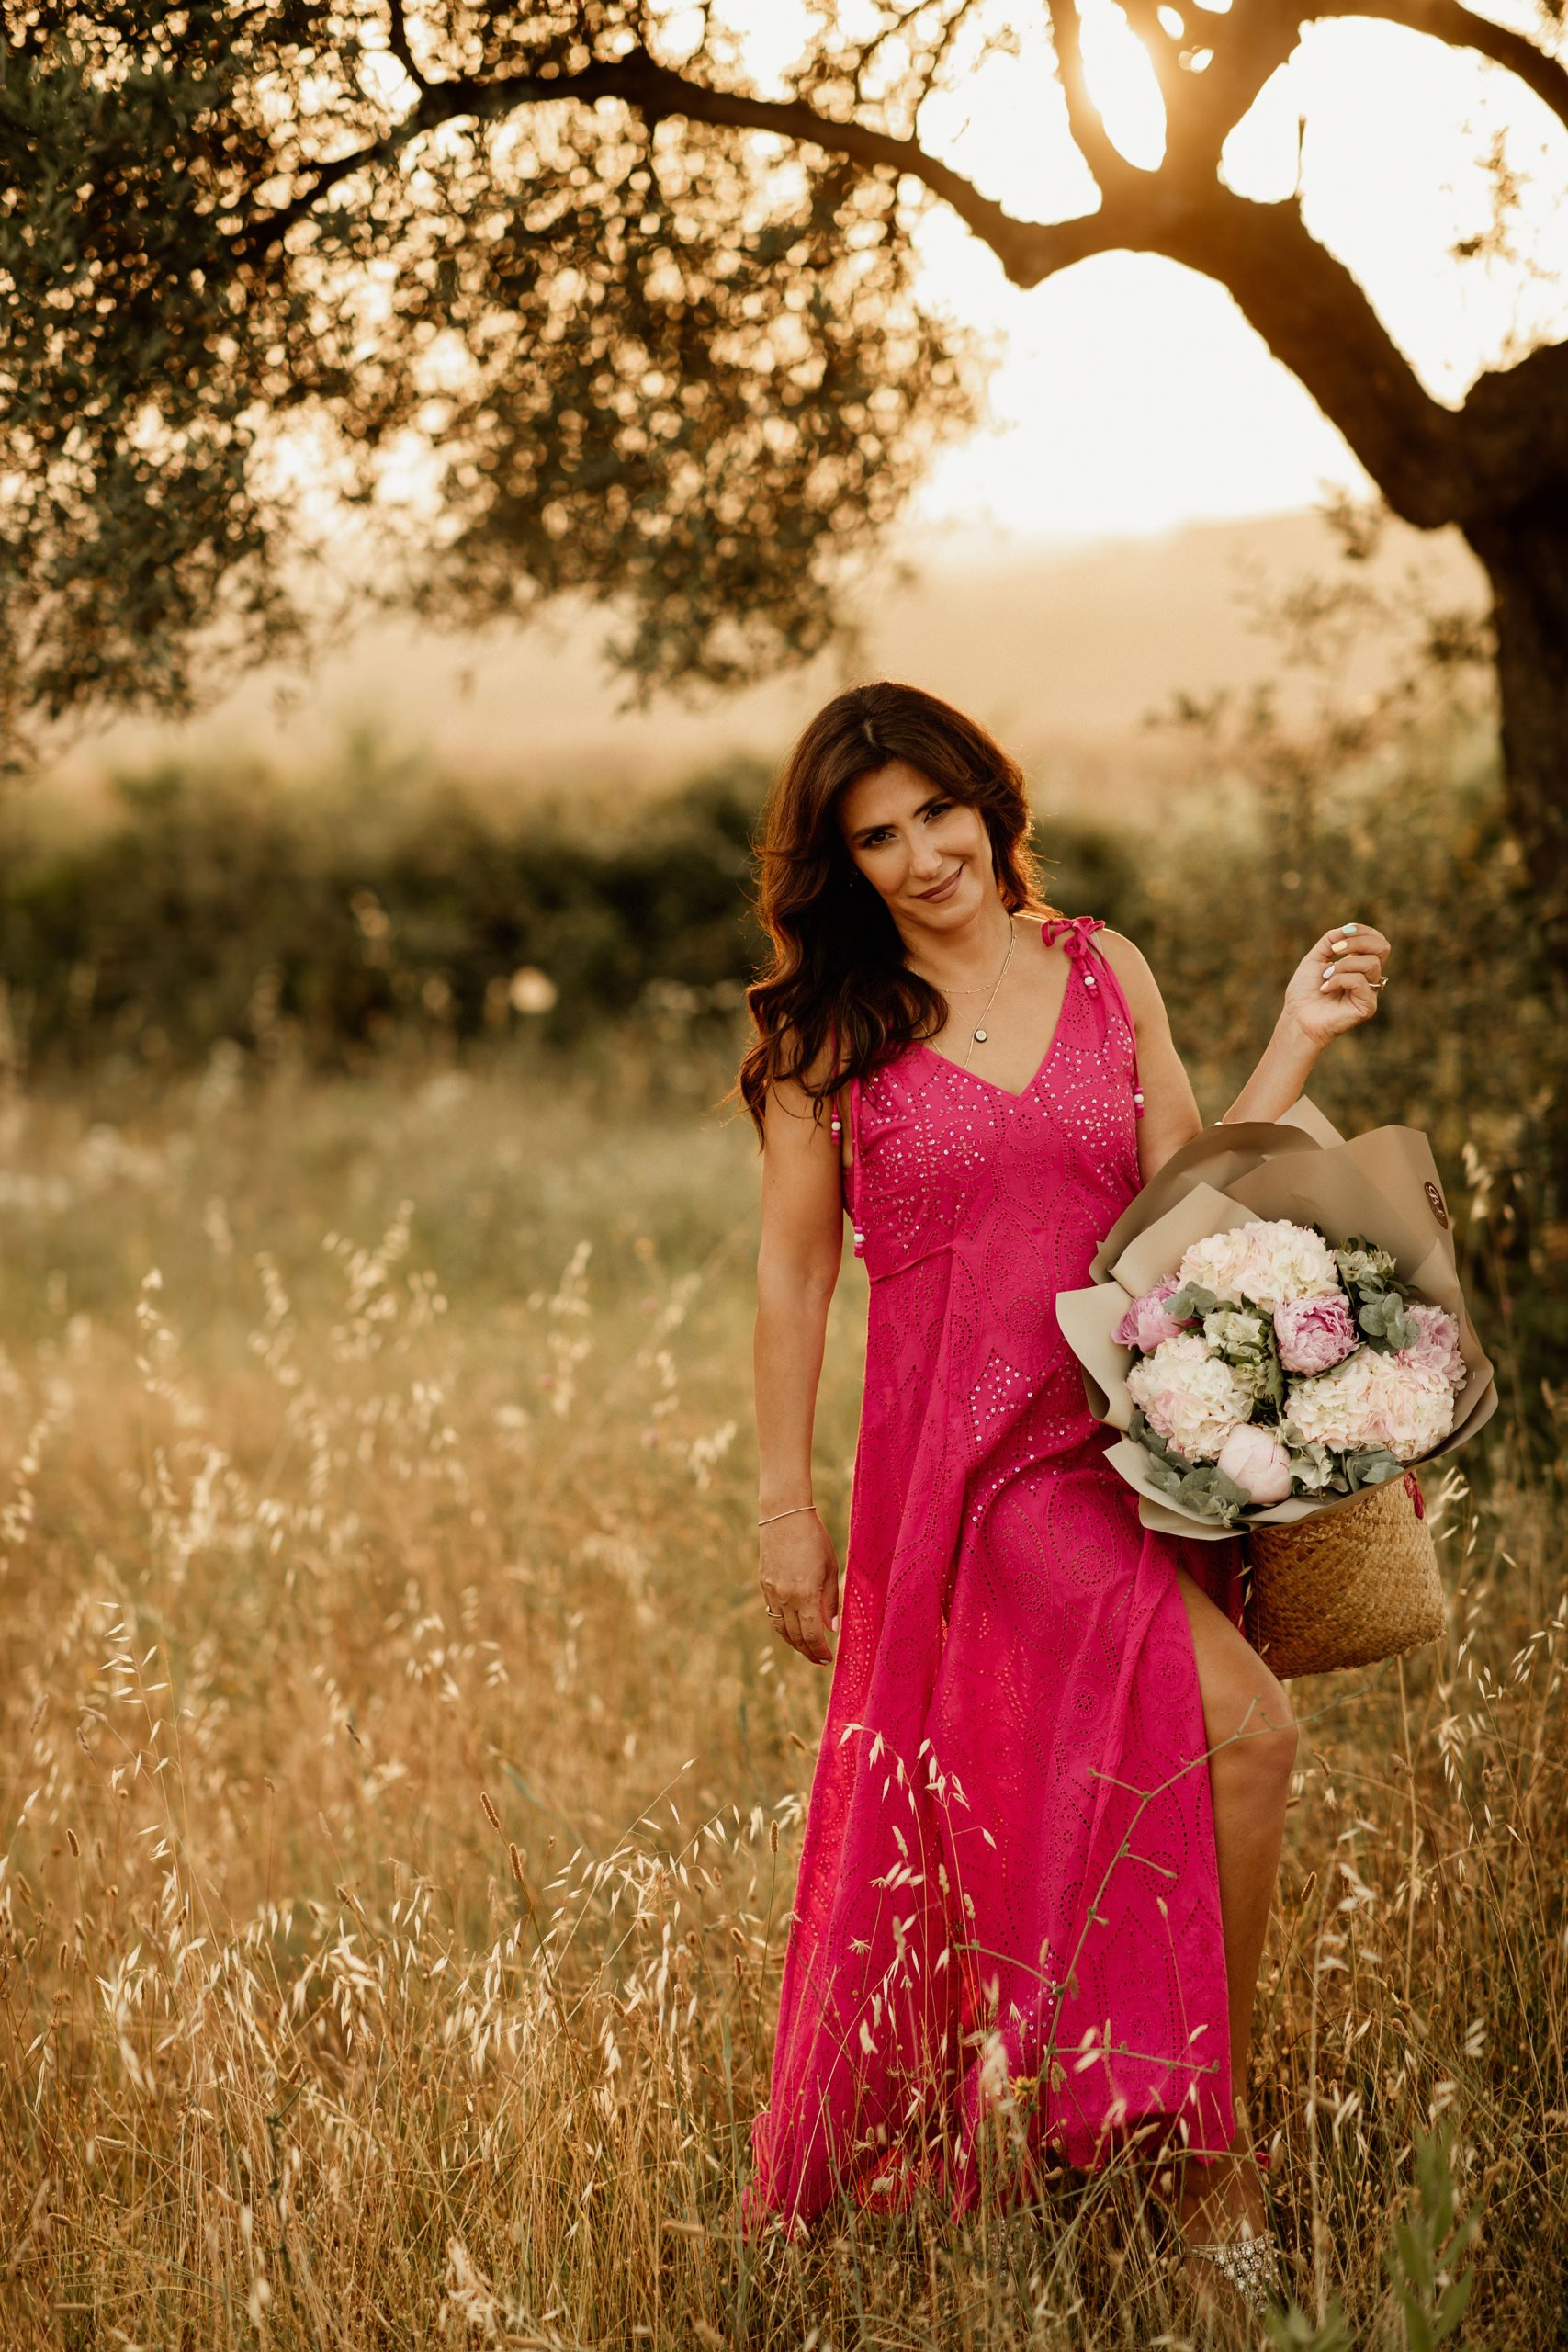 Field photoshoot with Iva Tico